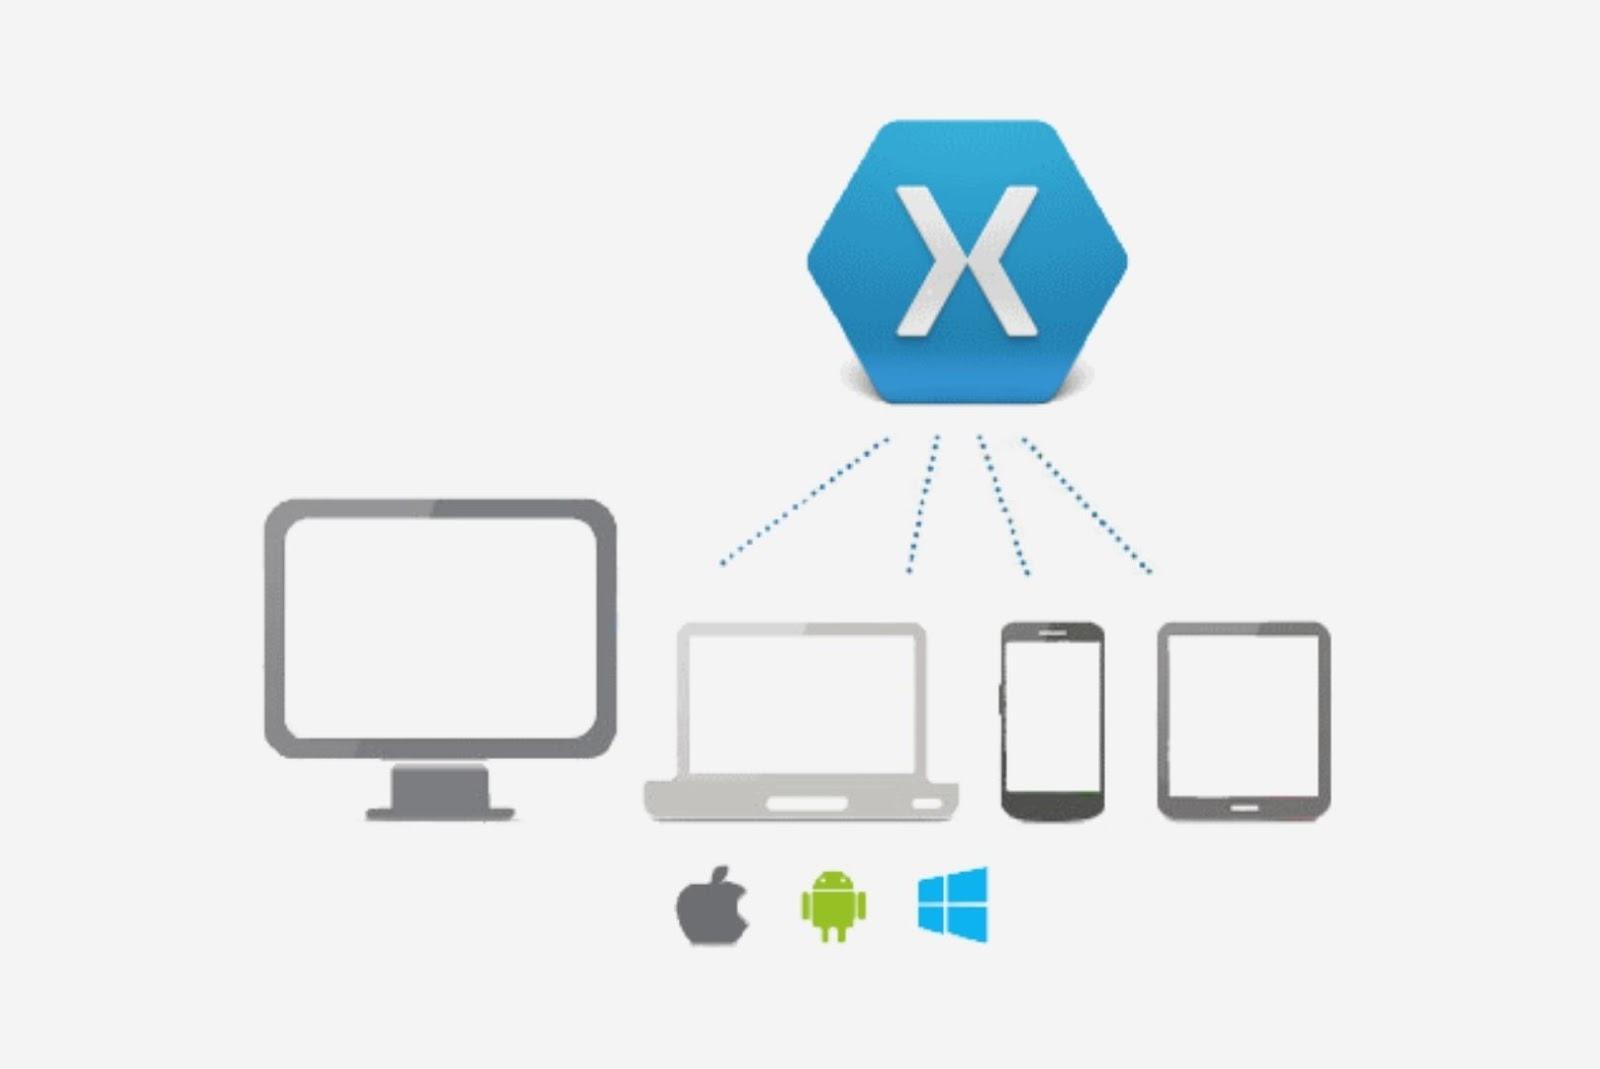 xamarin cross-platform app frameworks